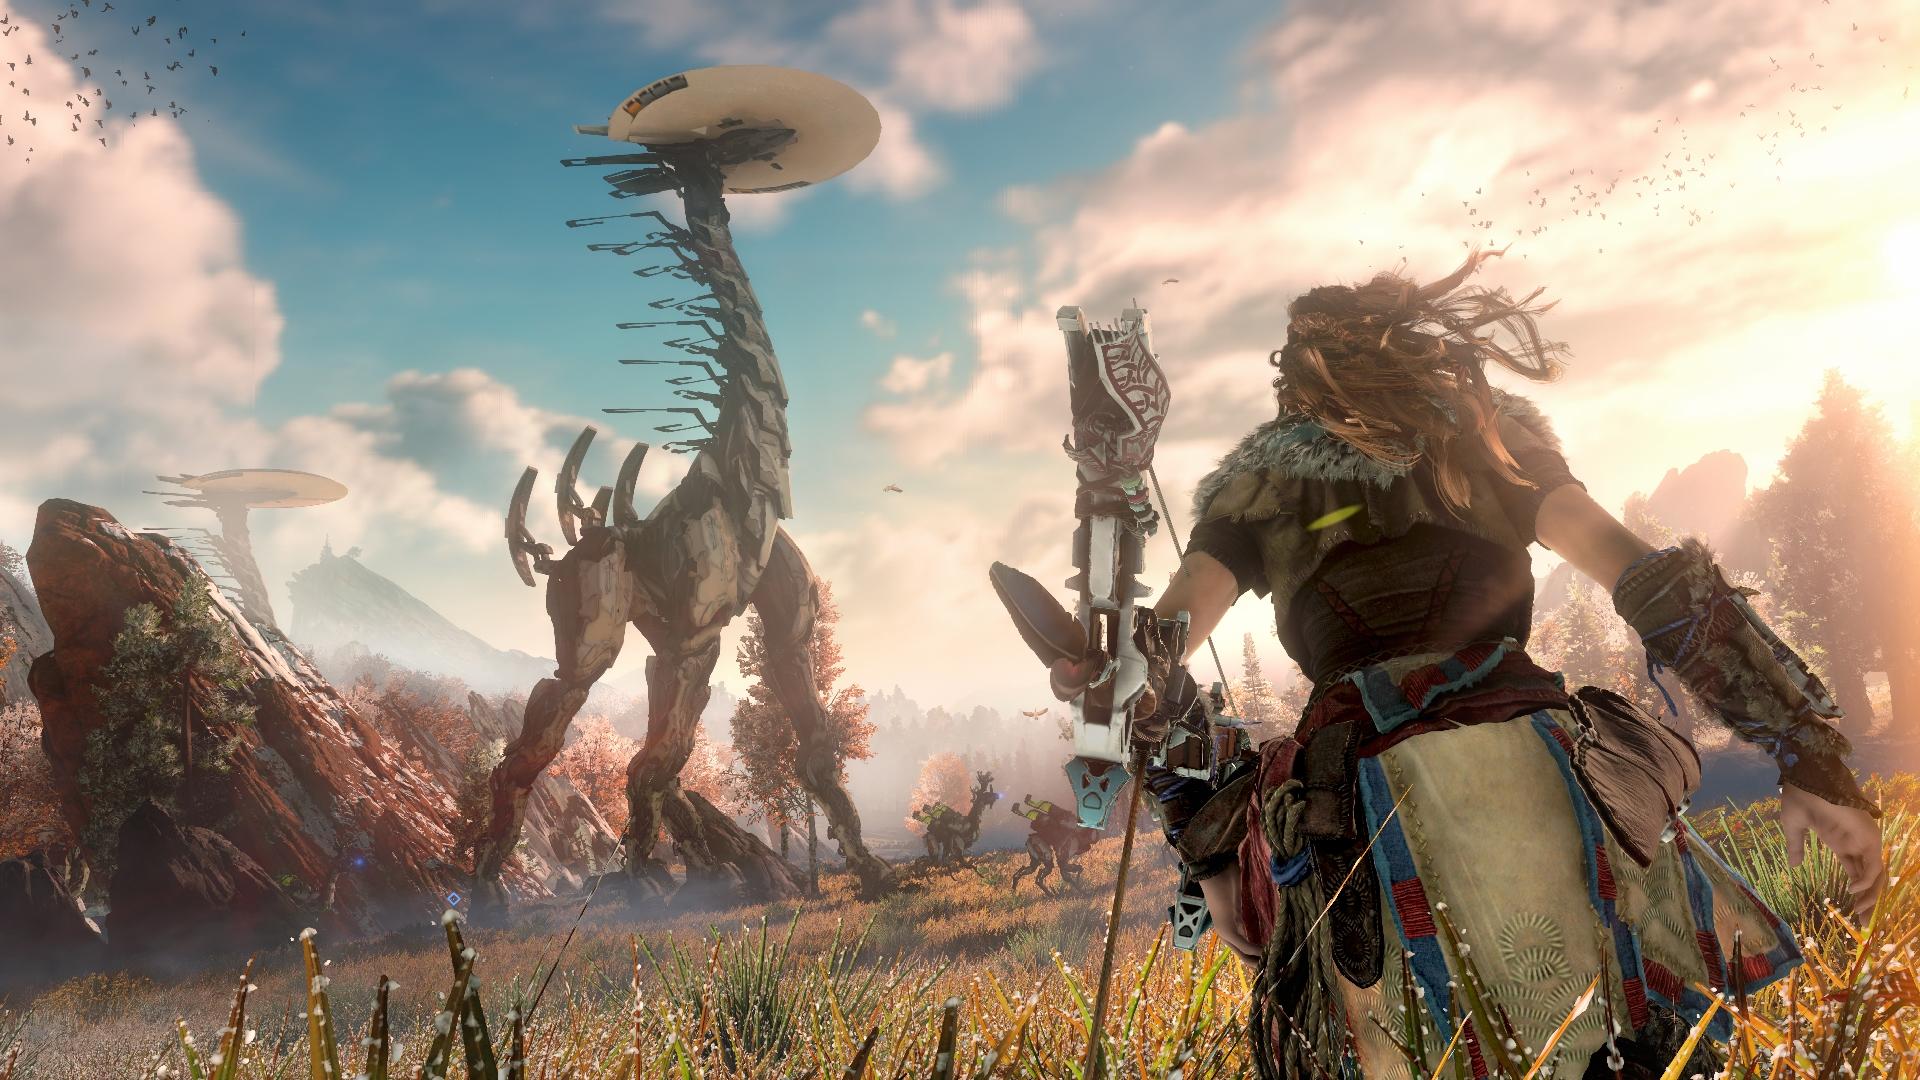 Horizon Zero Dawn dev working on new multiplayer game